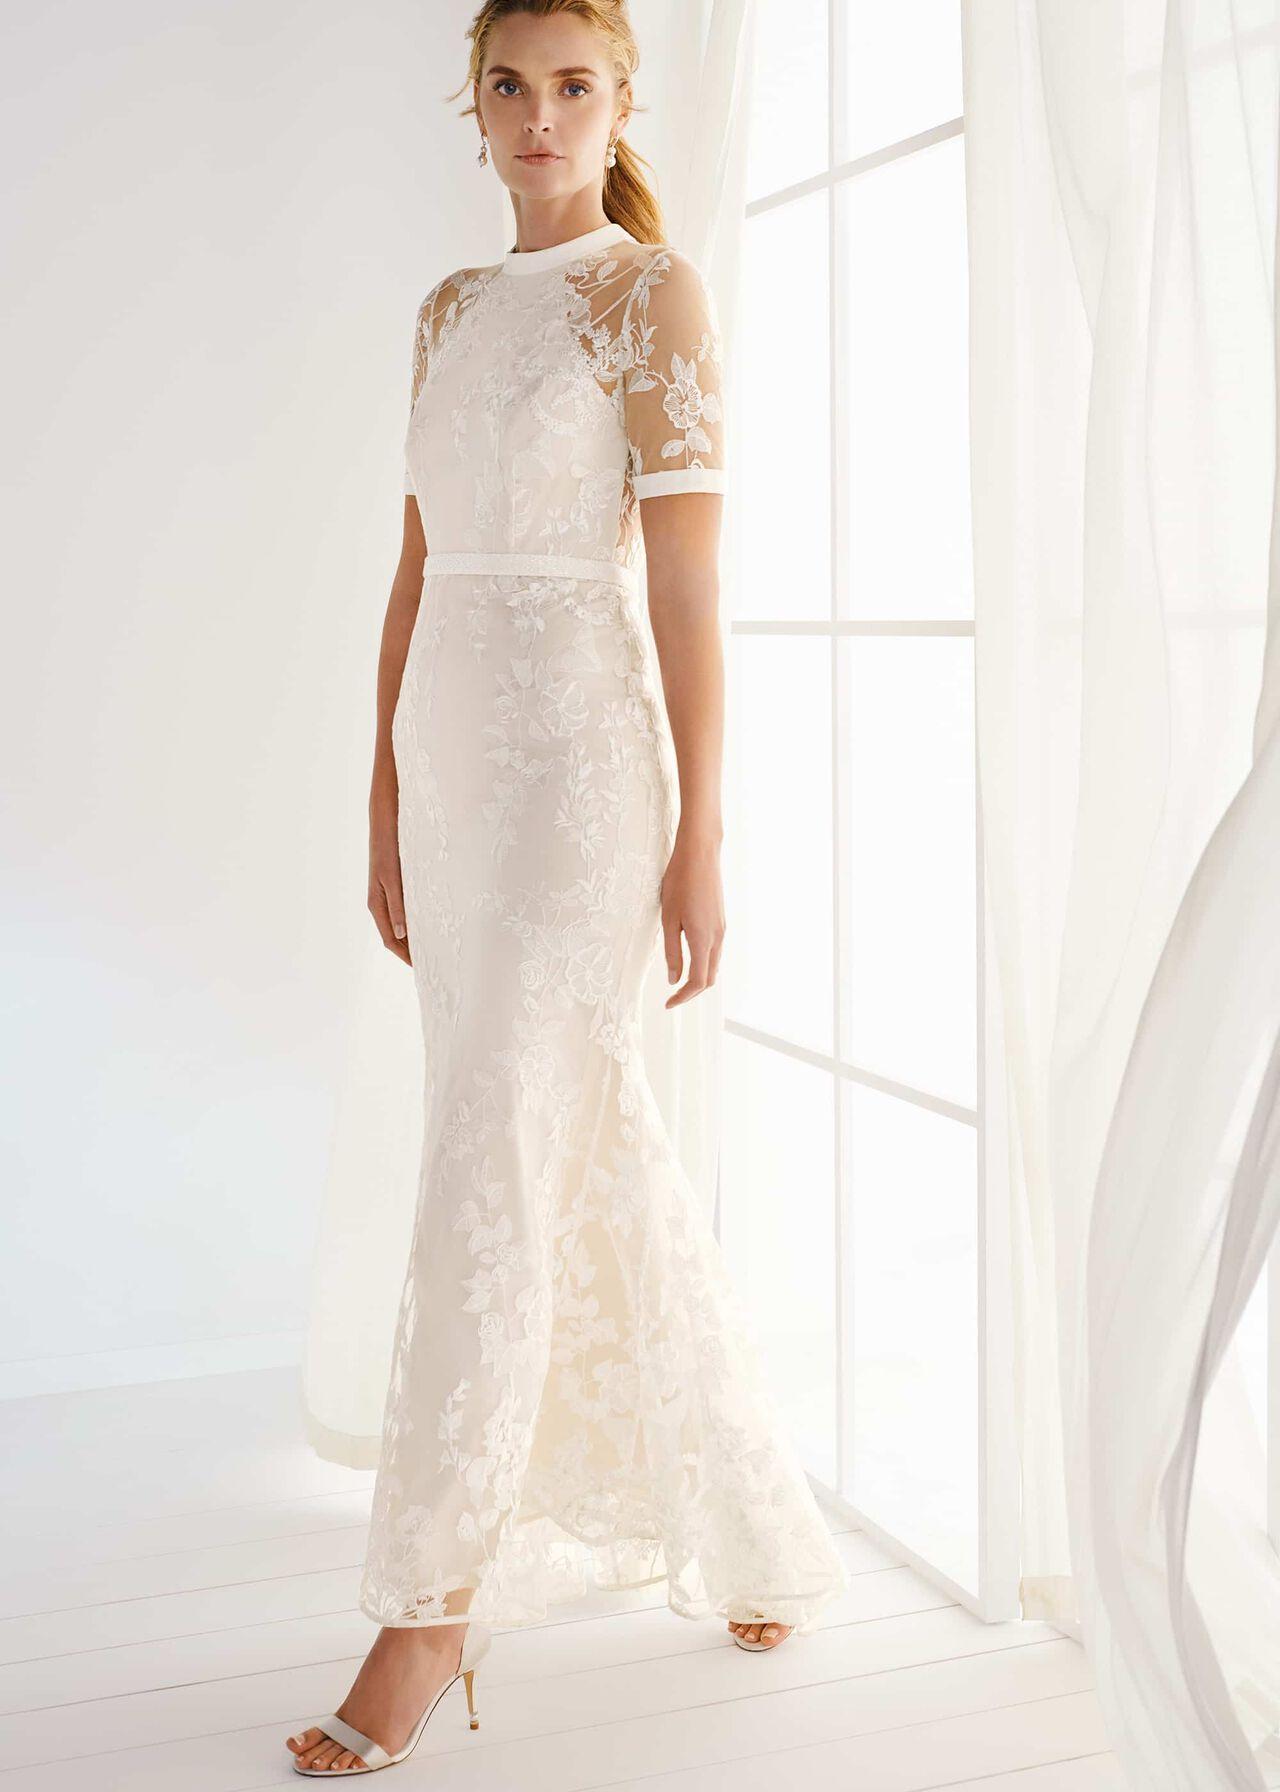 Phase Eight Wedding Dresses Ireland   Wedding Dress And Planner Online